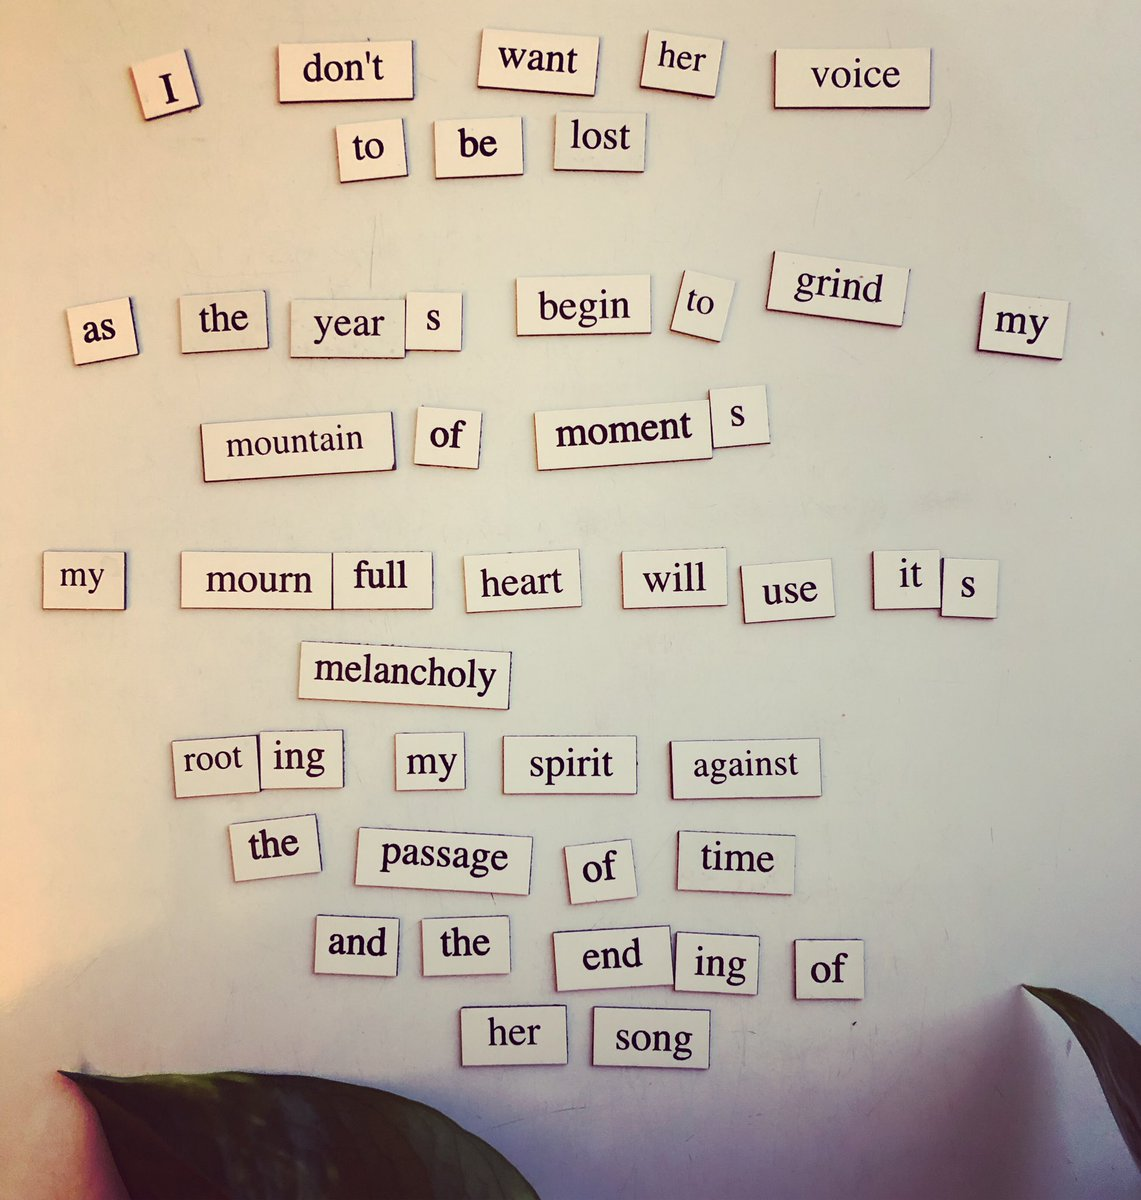 #nationalpoetrymonth . . . . . #poet #poem #poetry #poetrycommunity  #instapoetry #poetsofig  #instapoet #poetrylovers #instawriters #magneticpoetry #igwriters #poetsandwriters #poetryisnotdead #sadpoetry #suicideloss #youmatter #bethe1to #fatherdaughter #brokenheart #mourningpic.twitter.com/eIRzntBgVd